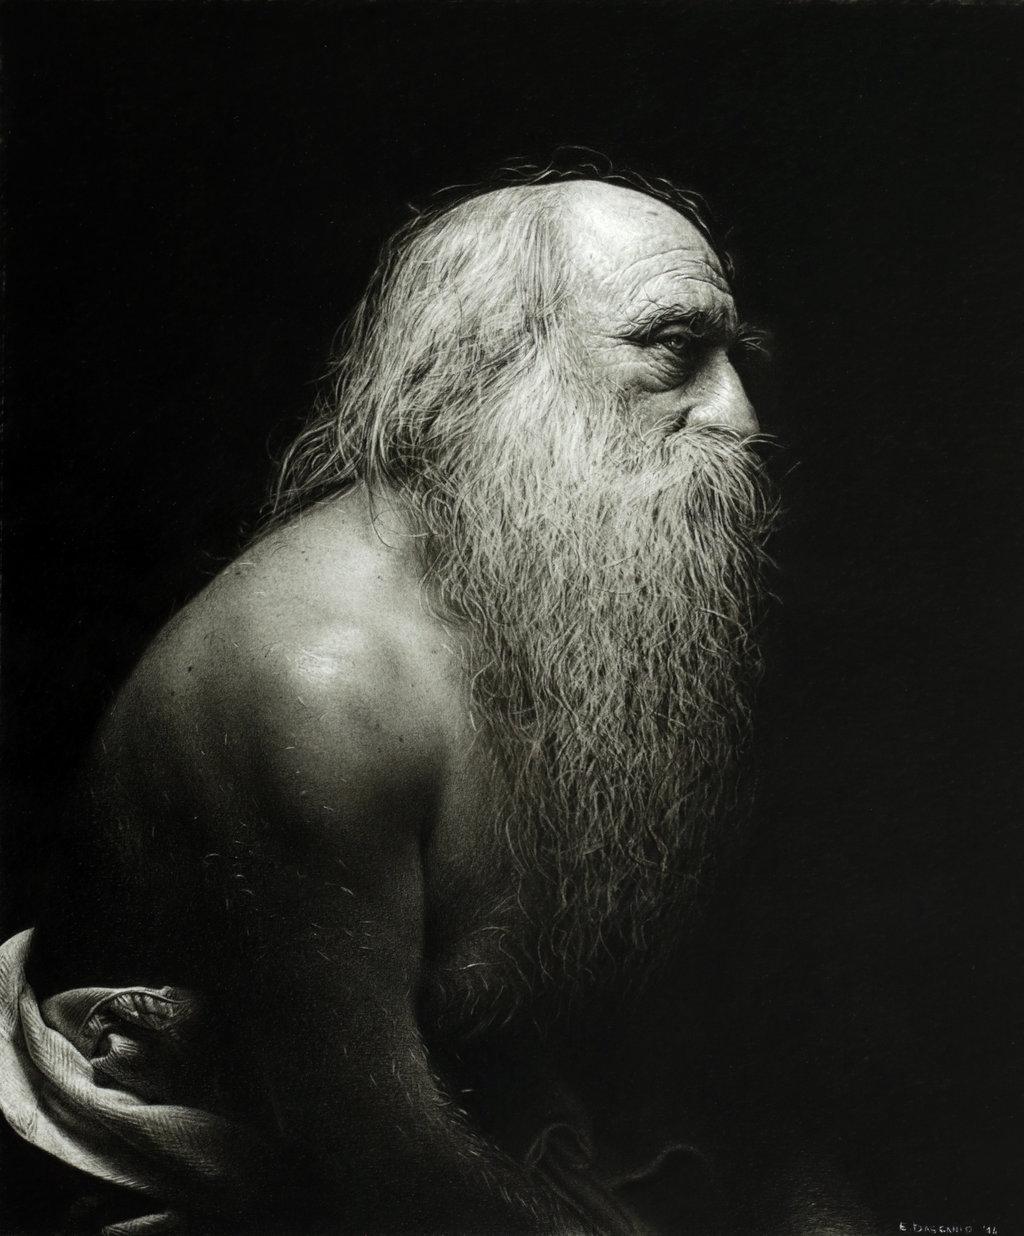 09-Naked-for-me-Leonardo-da-Vinci-Emanuele-Dascanio-Using-Old-Master-Techniques-for-Pencil-Drawings-www-designstack-co